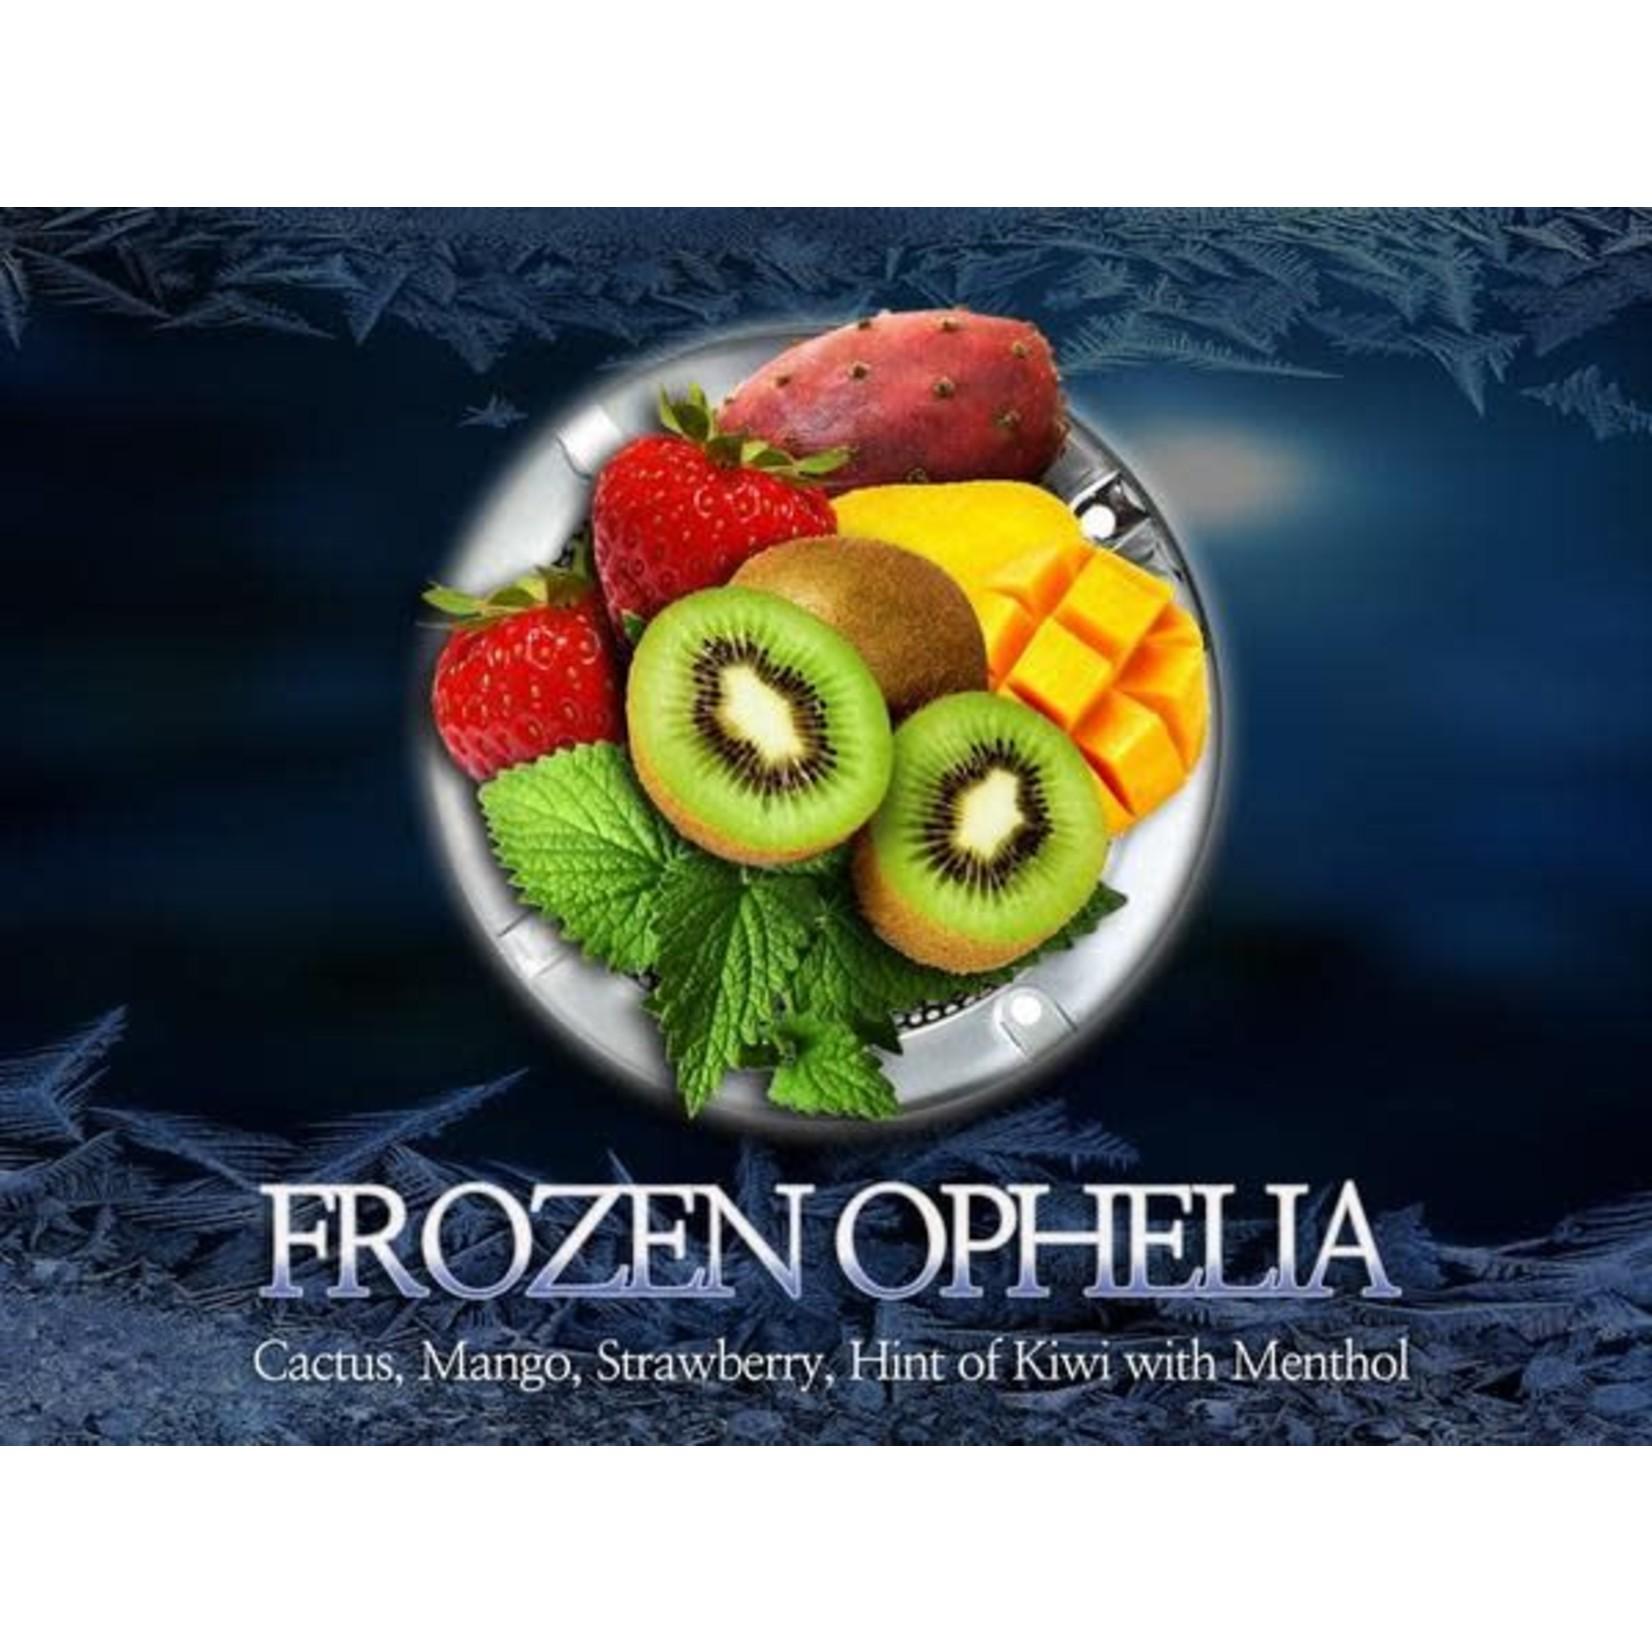 Vango Frozen Ophelia